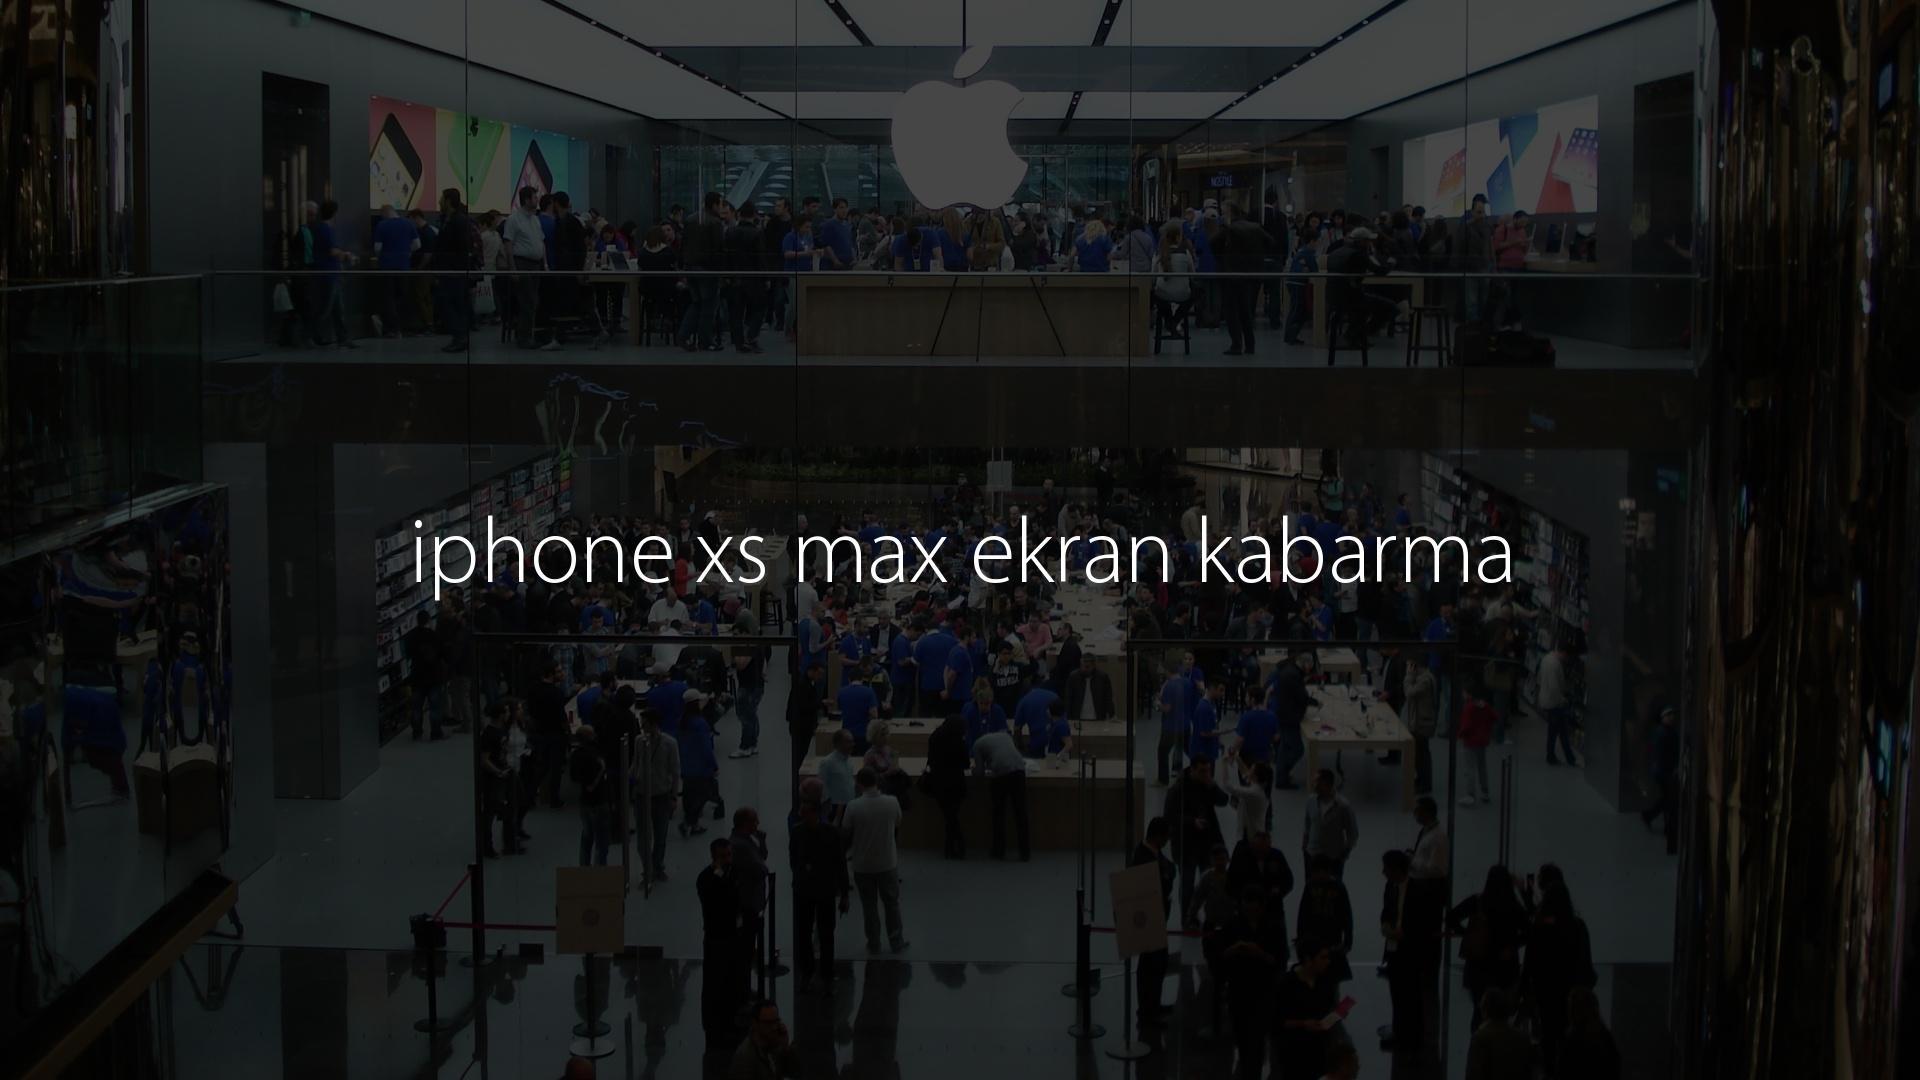 iphone xs max ekran kabarma